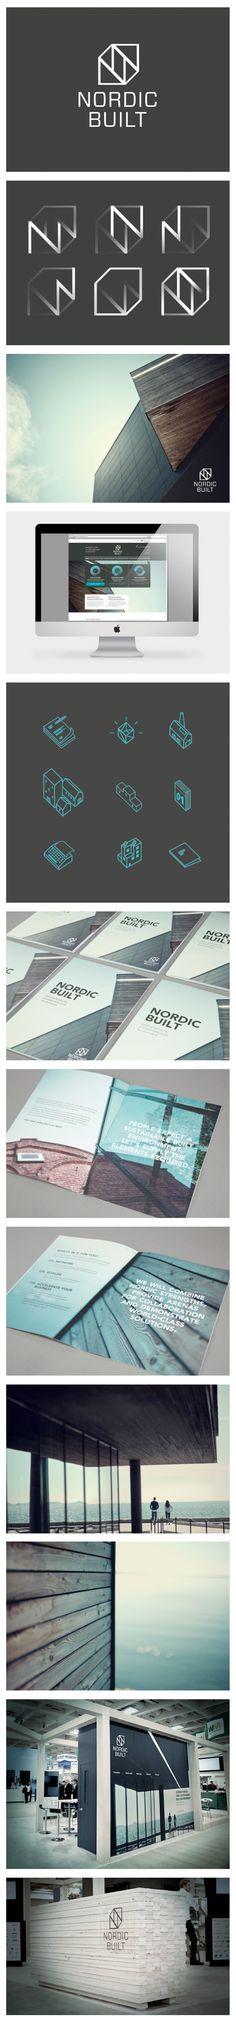 NORDIC BUILT - Branding, Exhibition Design